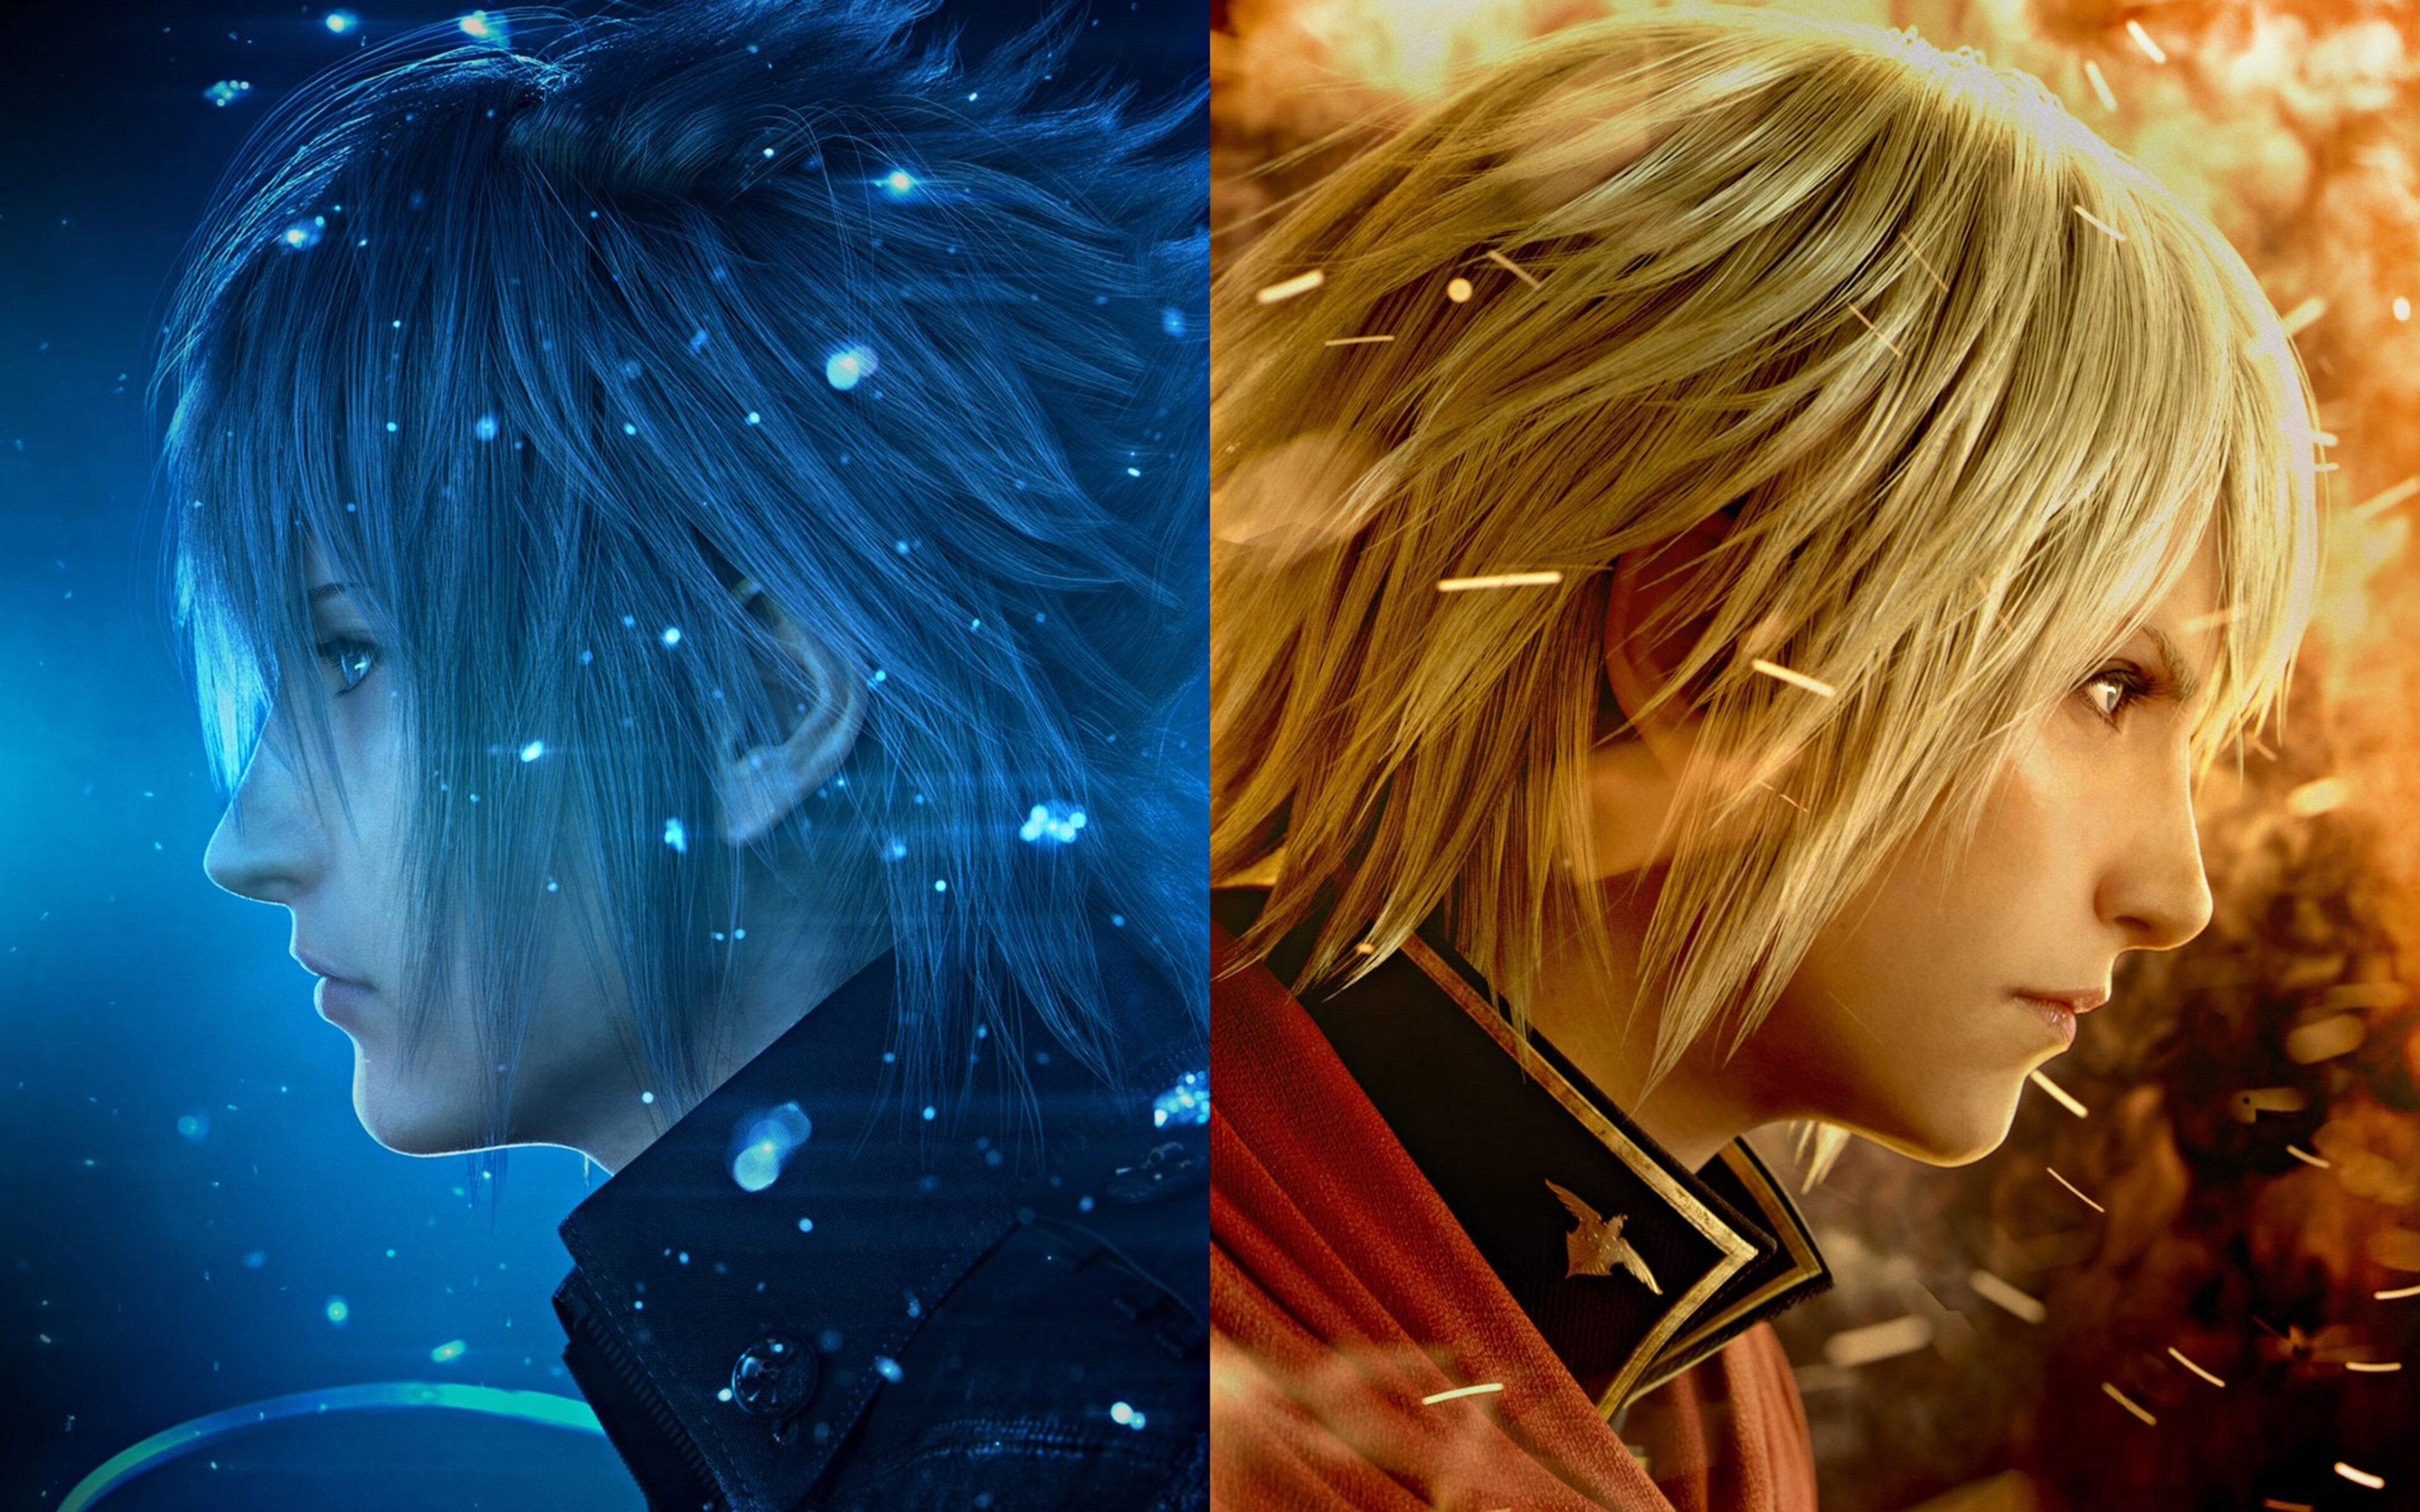 Aranea Highwind Final Fantasy Xv 5k Hd Games 4k: 3840x2400 Final Fantasy Type 0 4k HD 4k Wallpapers, Images